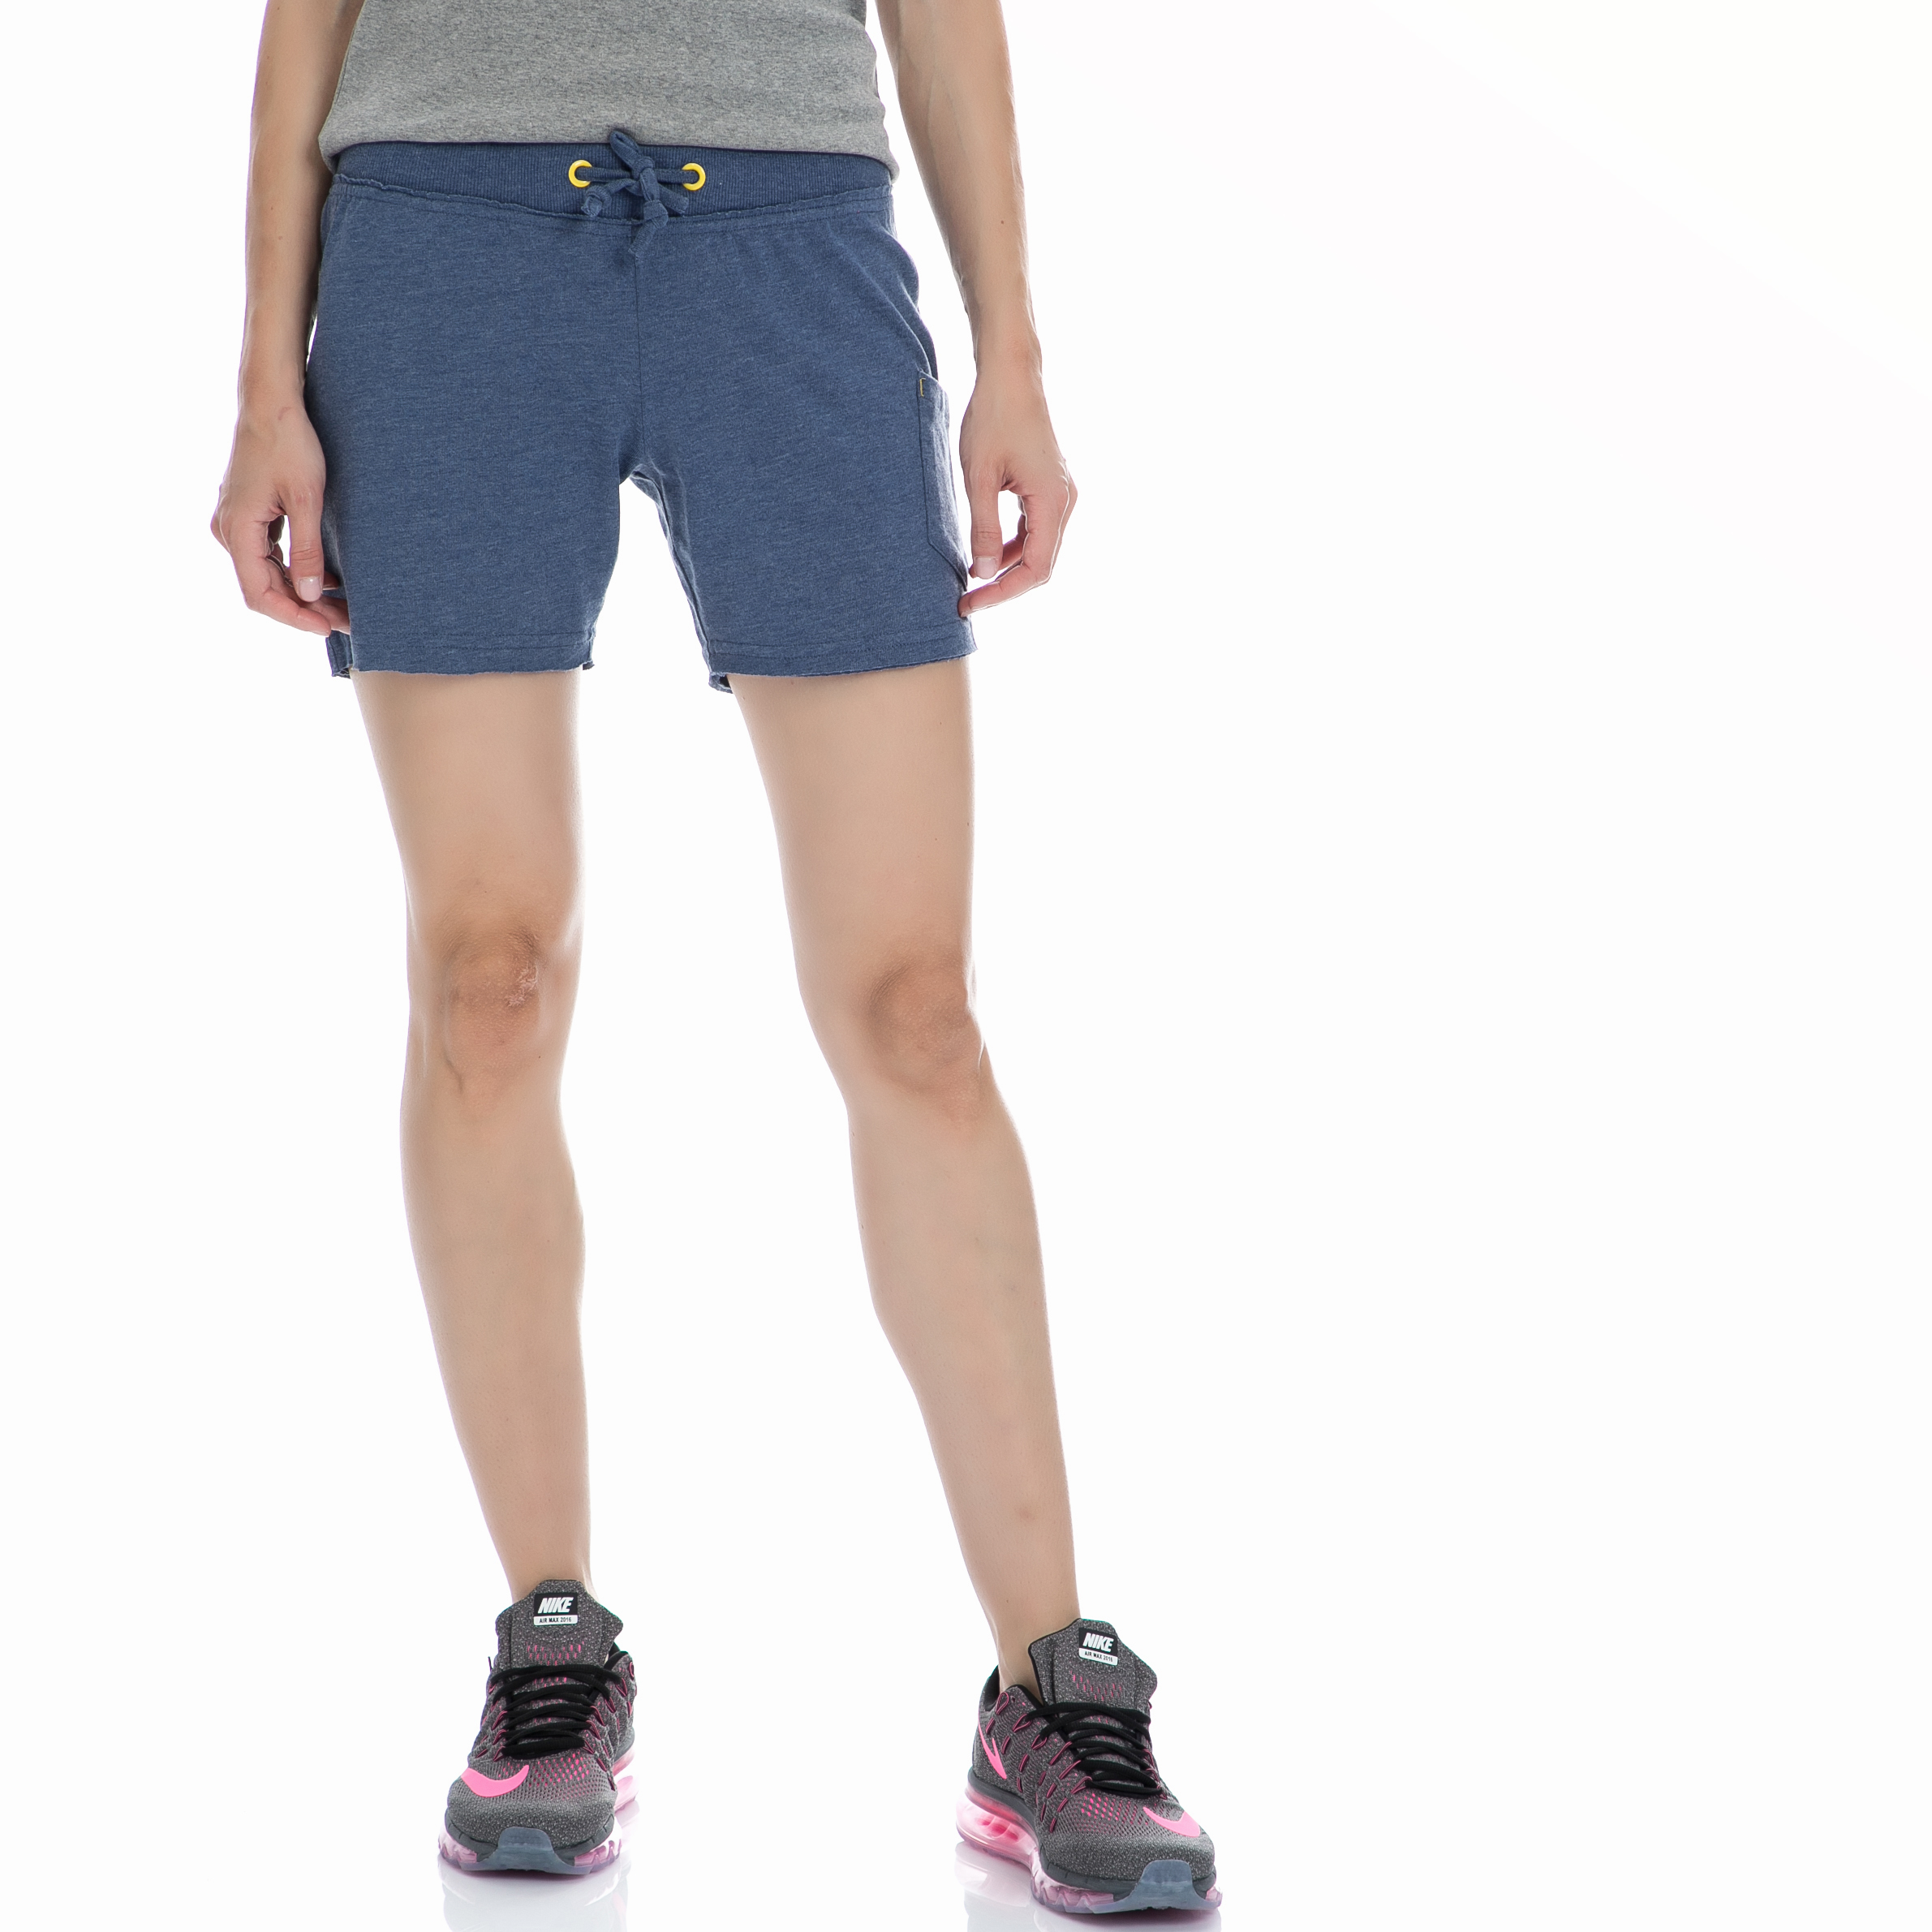 BODYTALK - Γυαναικείο σορτς BODYTALK μπλε γυναικεία ρούχα σορτς βερμούδες αθλητικά